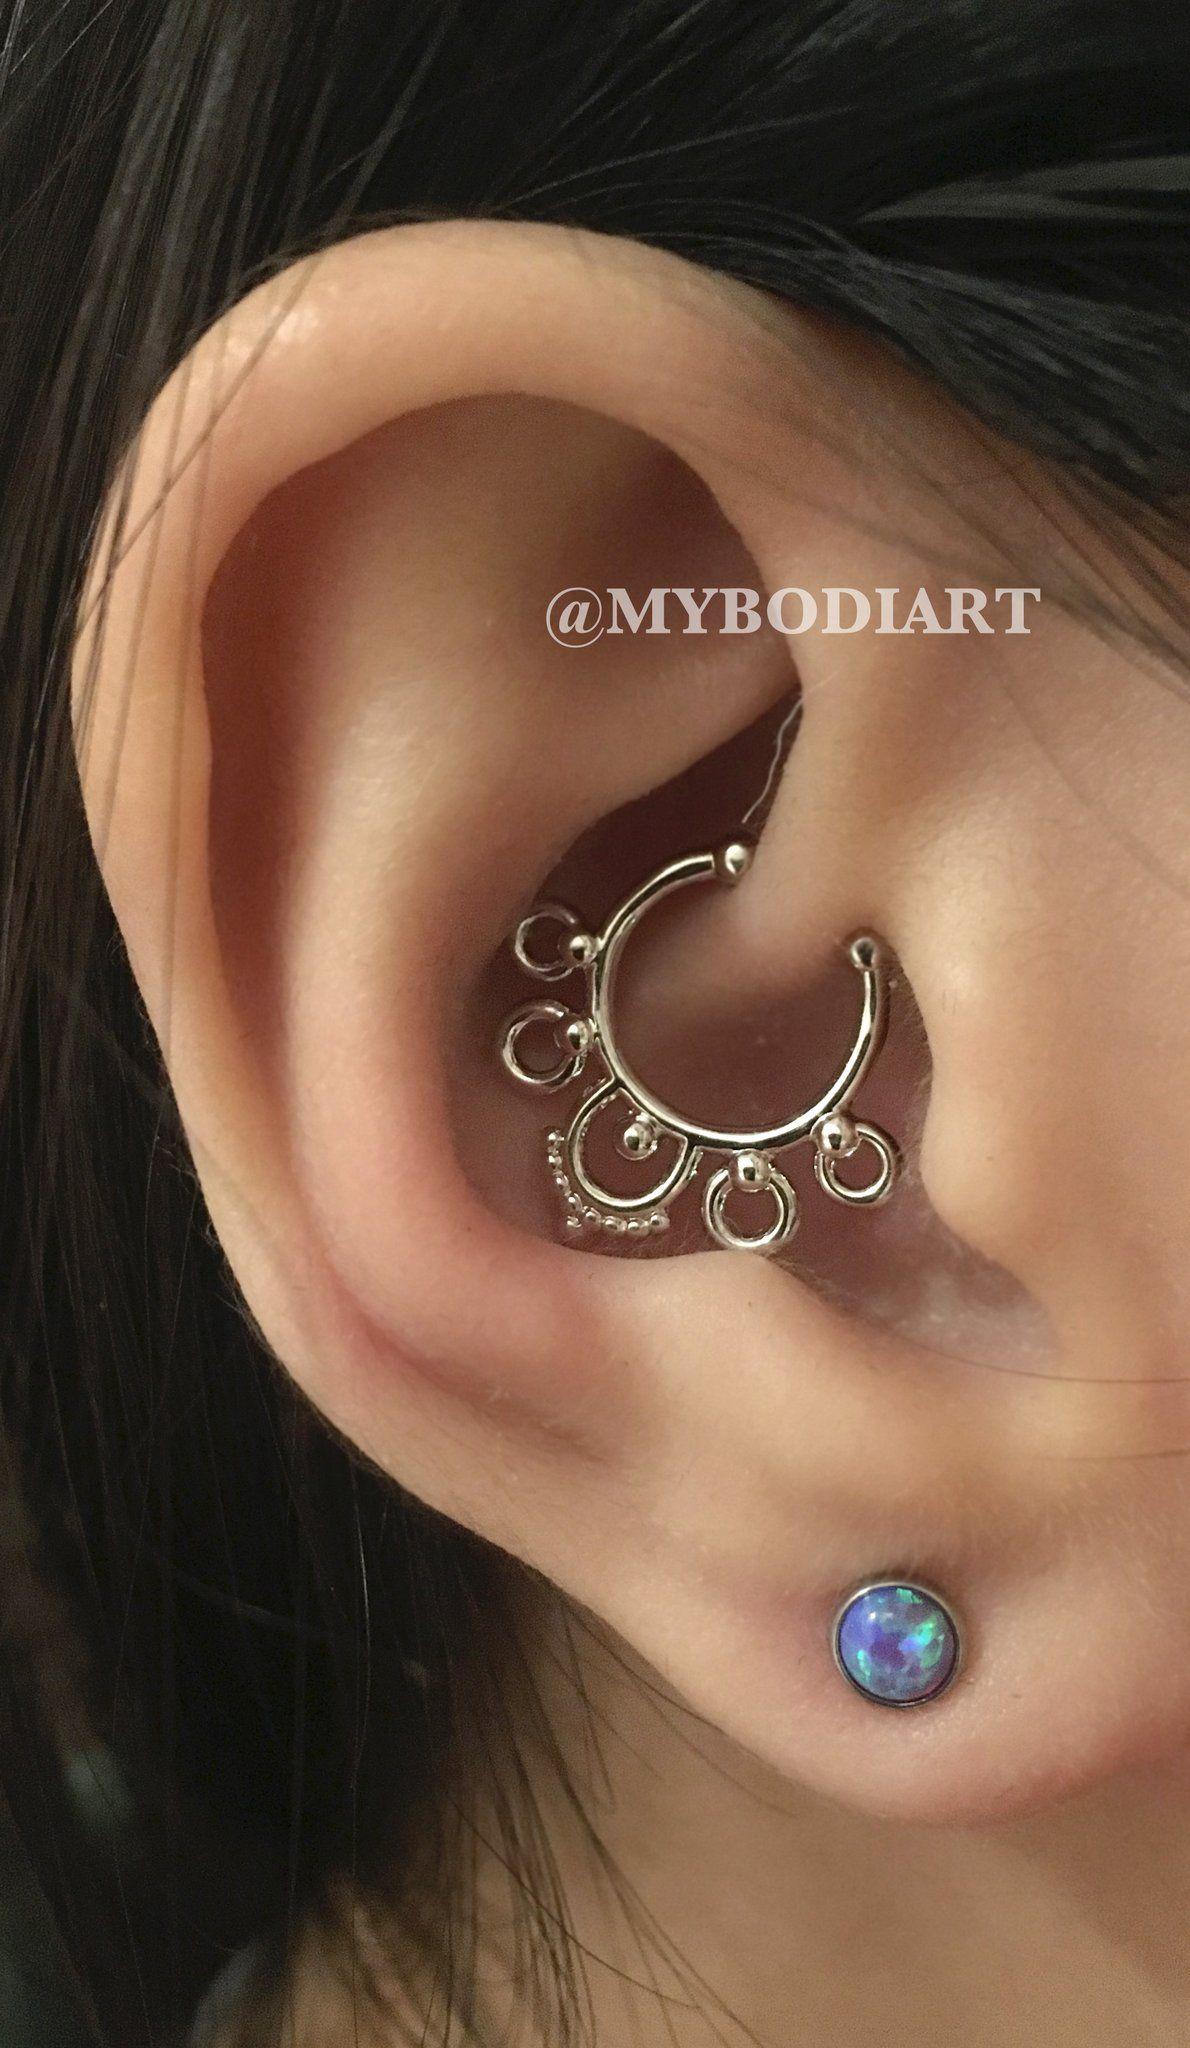 Pretty piercing ideas  Pretty Ear Piercing Ideas for Teens  Gold Cartilage Jewelry Daith